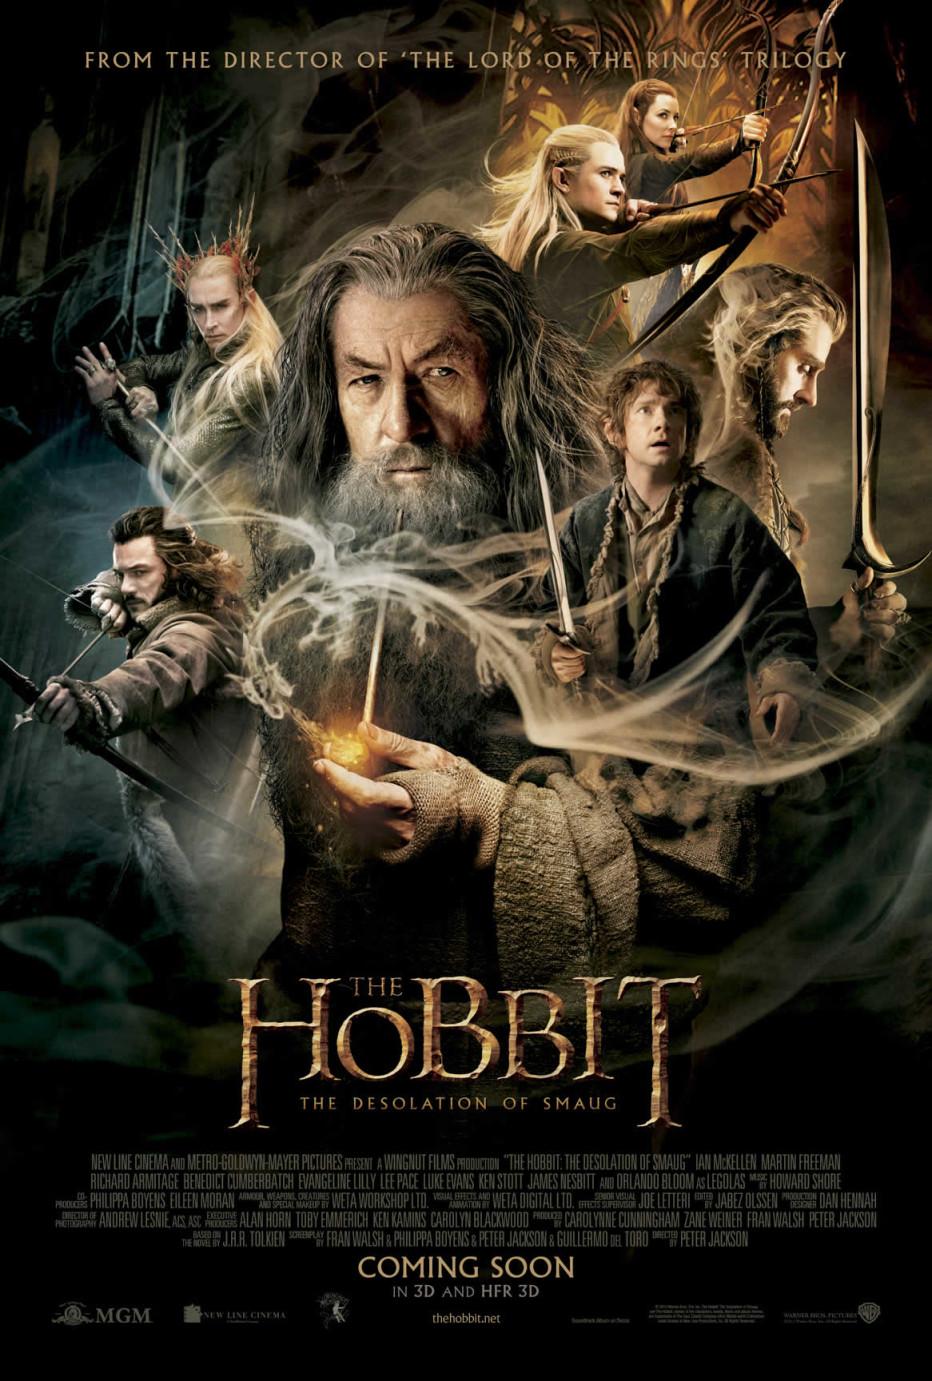 Хобит: Пустошот на Смауг HFR 3D The Hobbit: The Desolation of Smaug